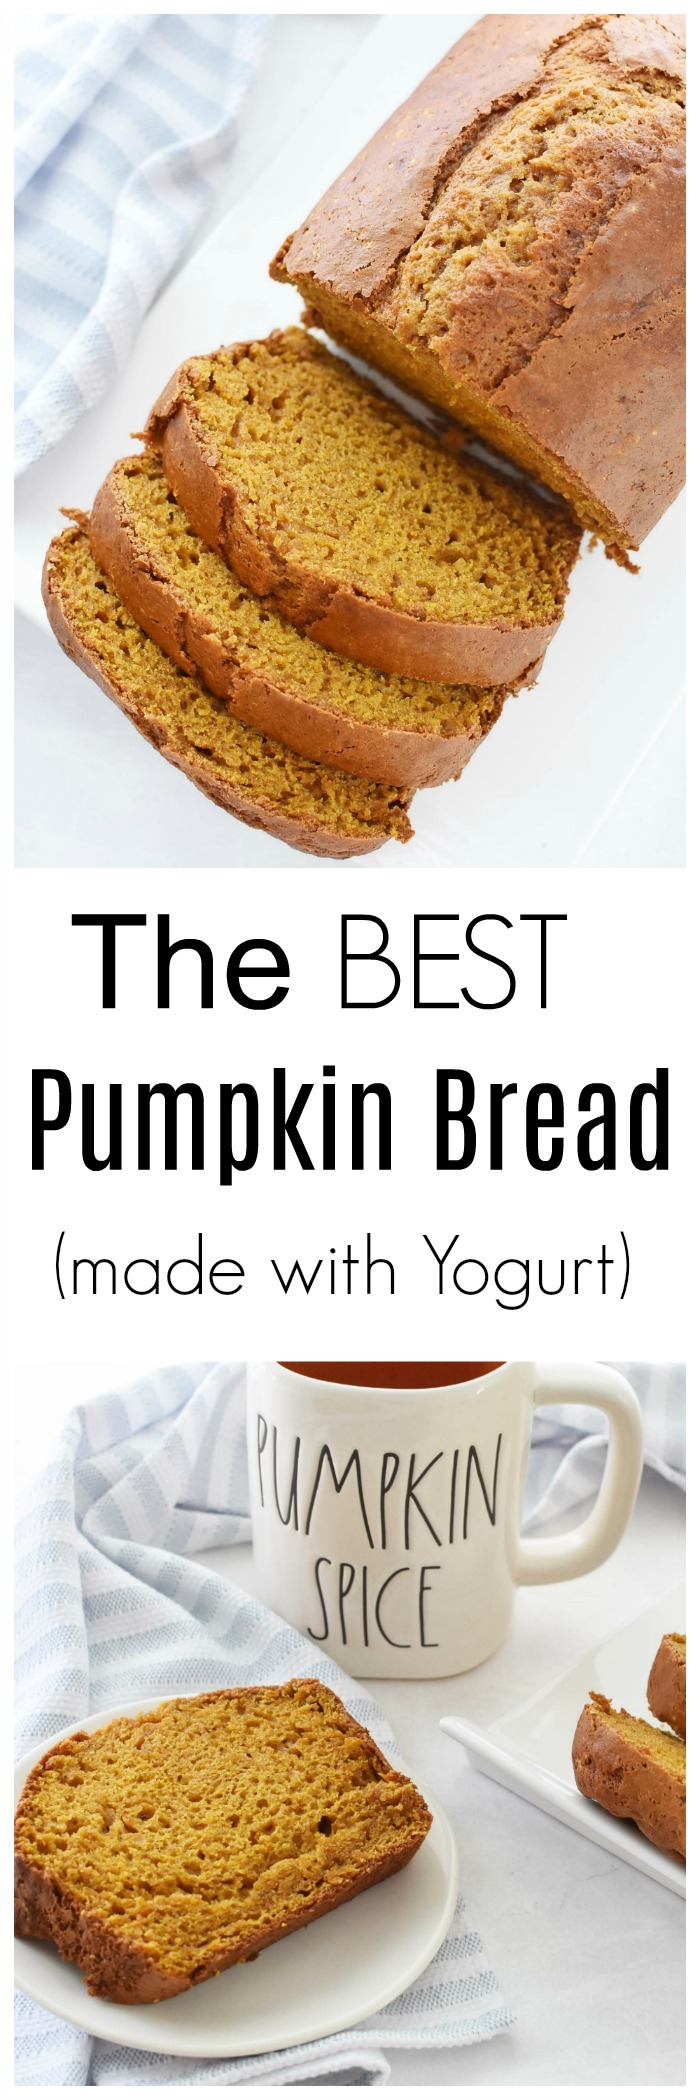 Pumpkin Bread Made with Yogurt